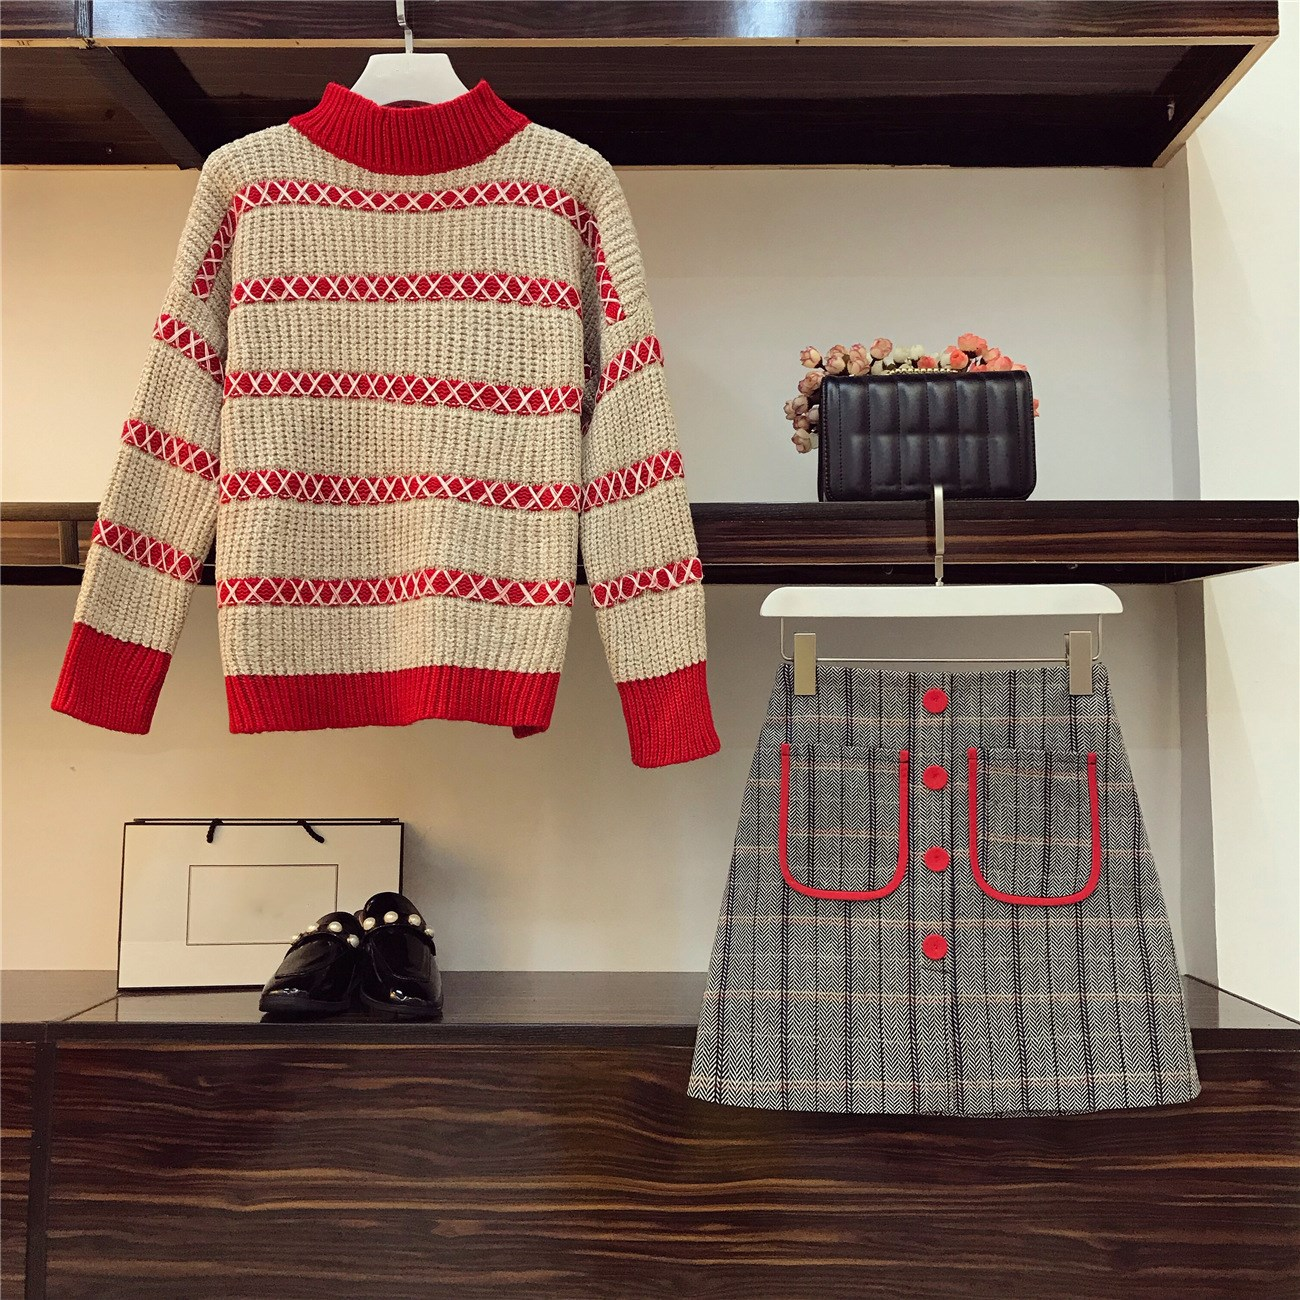 Women Knit Long sleeve Sweater Skirt Suits Women Sweet Pullover Knit Sweater Top A line Gird Skirt Women 39 s 2pcs Set in Women 39 s Sets from Women 39 s Clothing